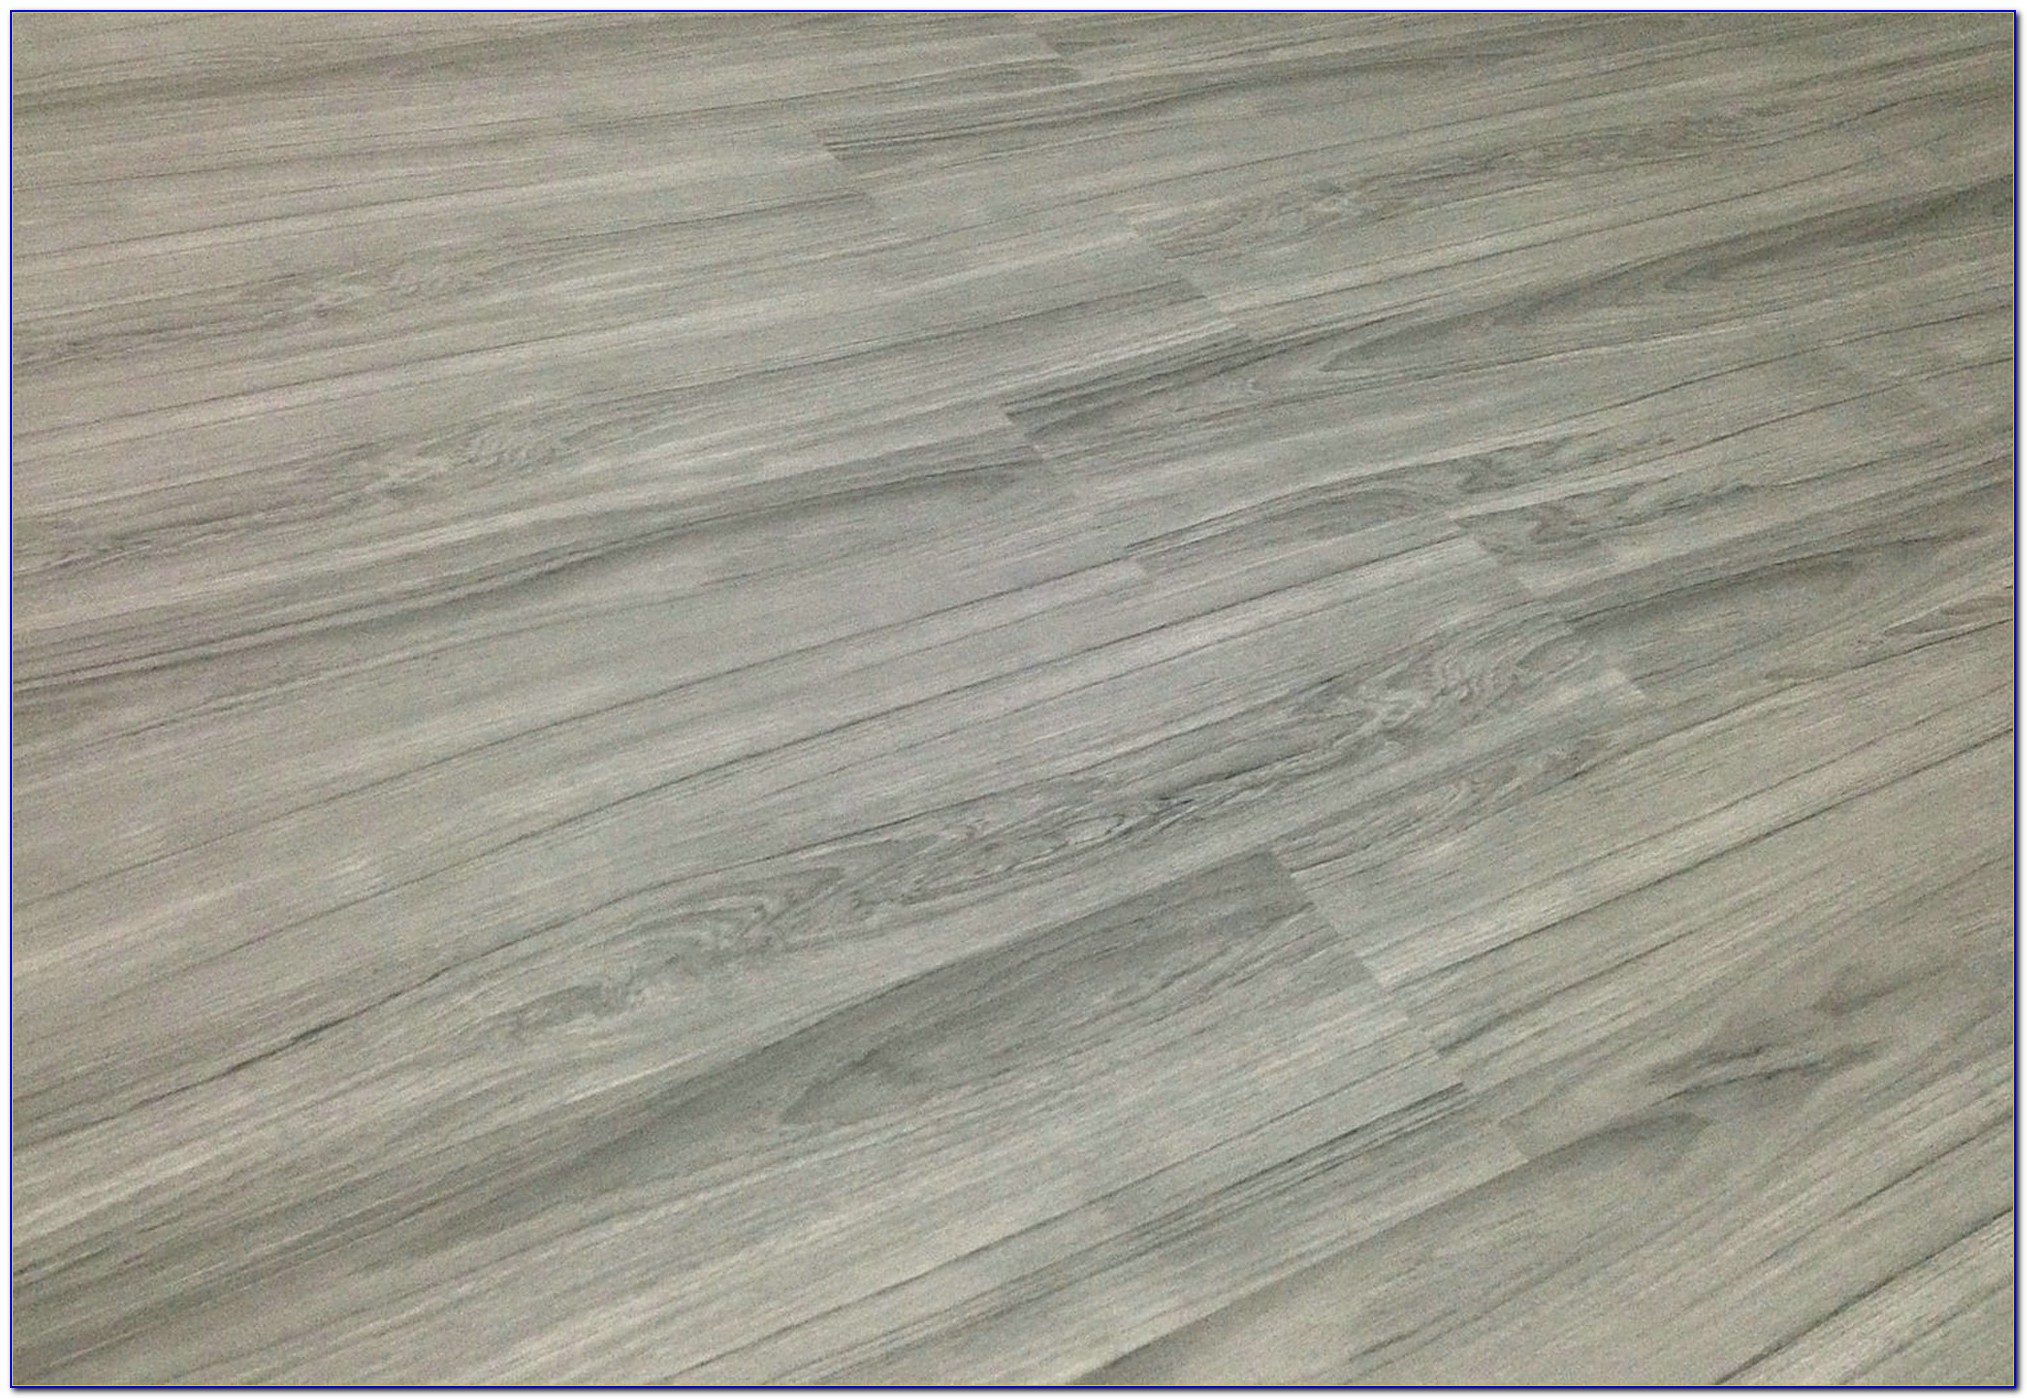 Vesdura Vinyl Plank Flooring Aged Oak